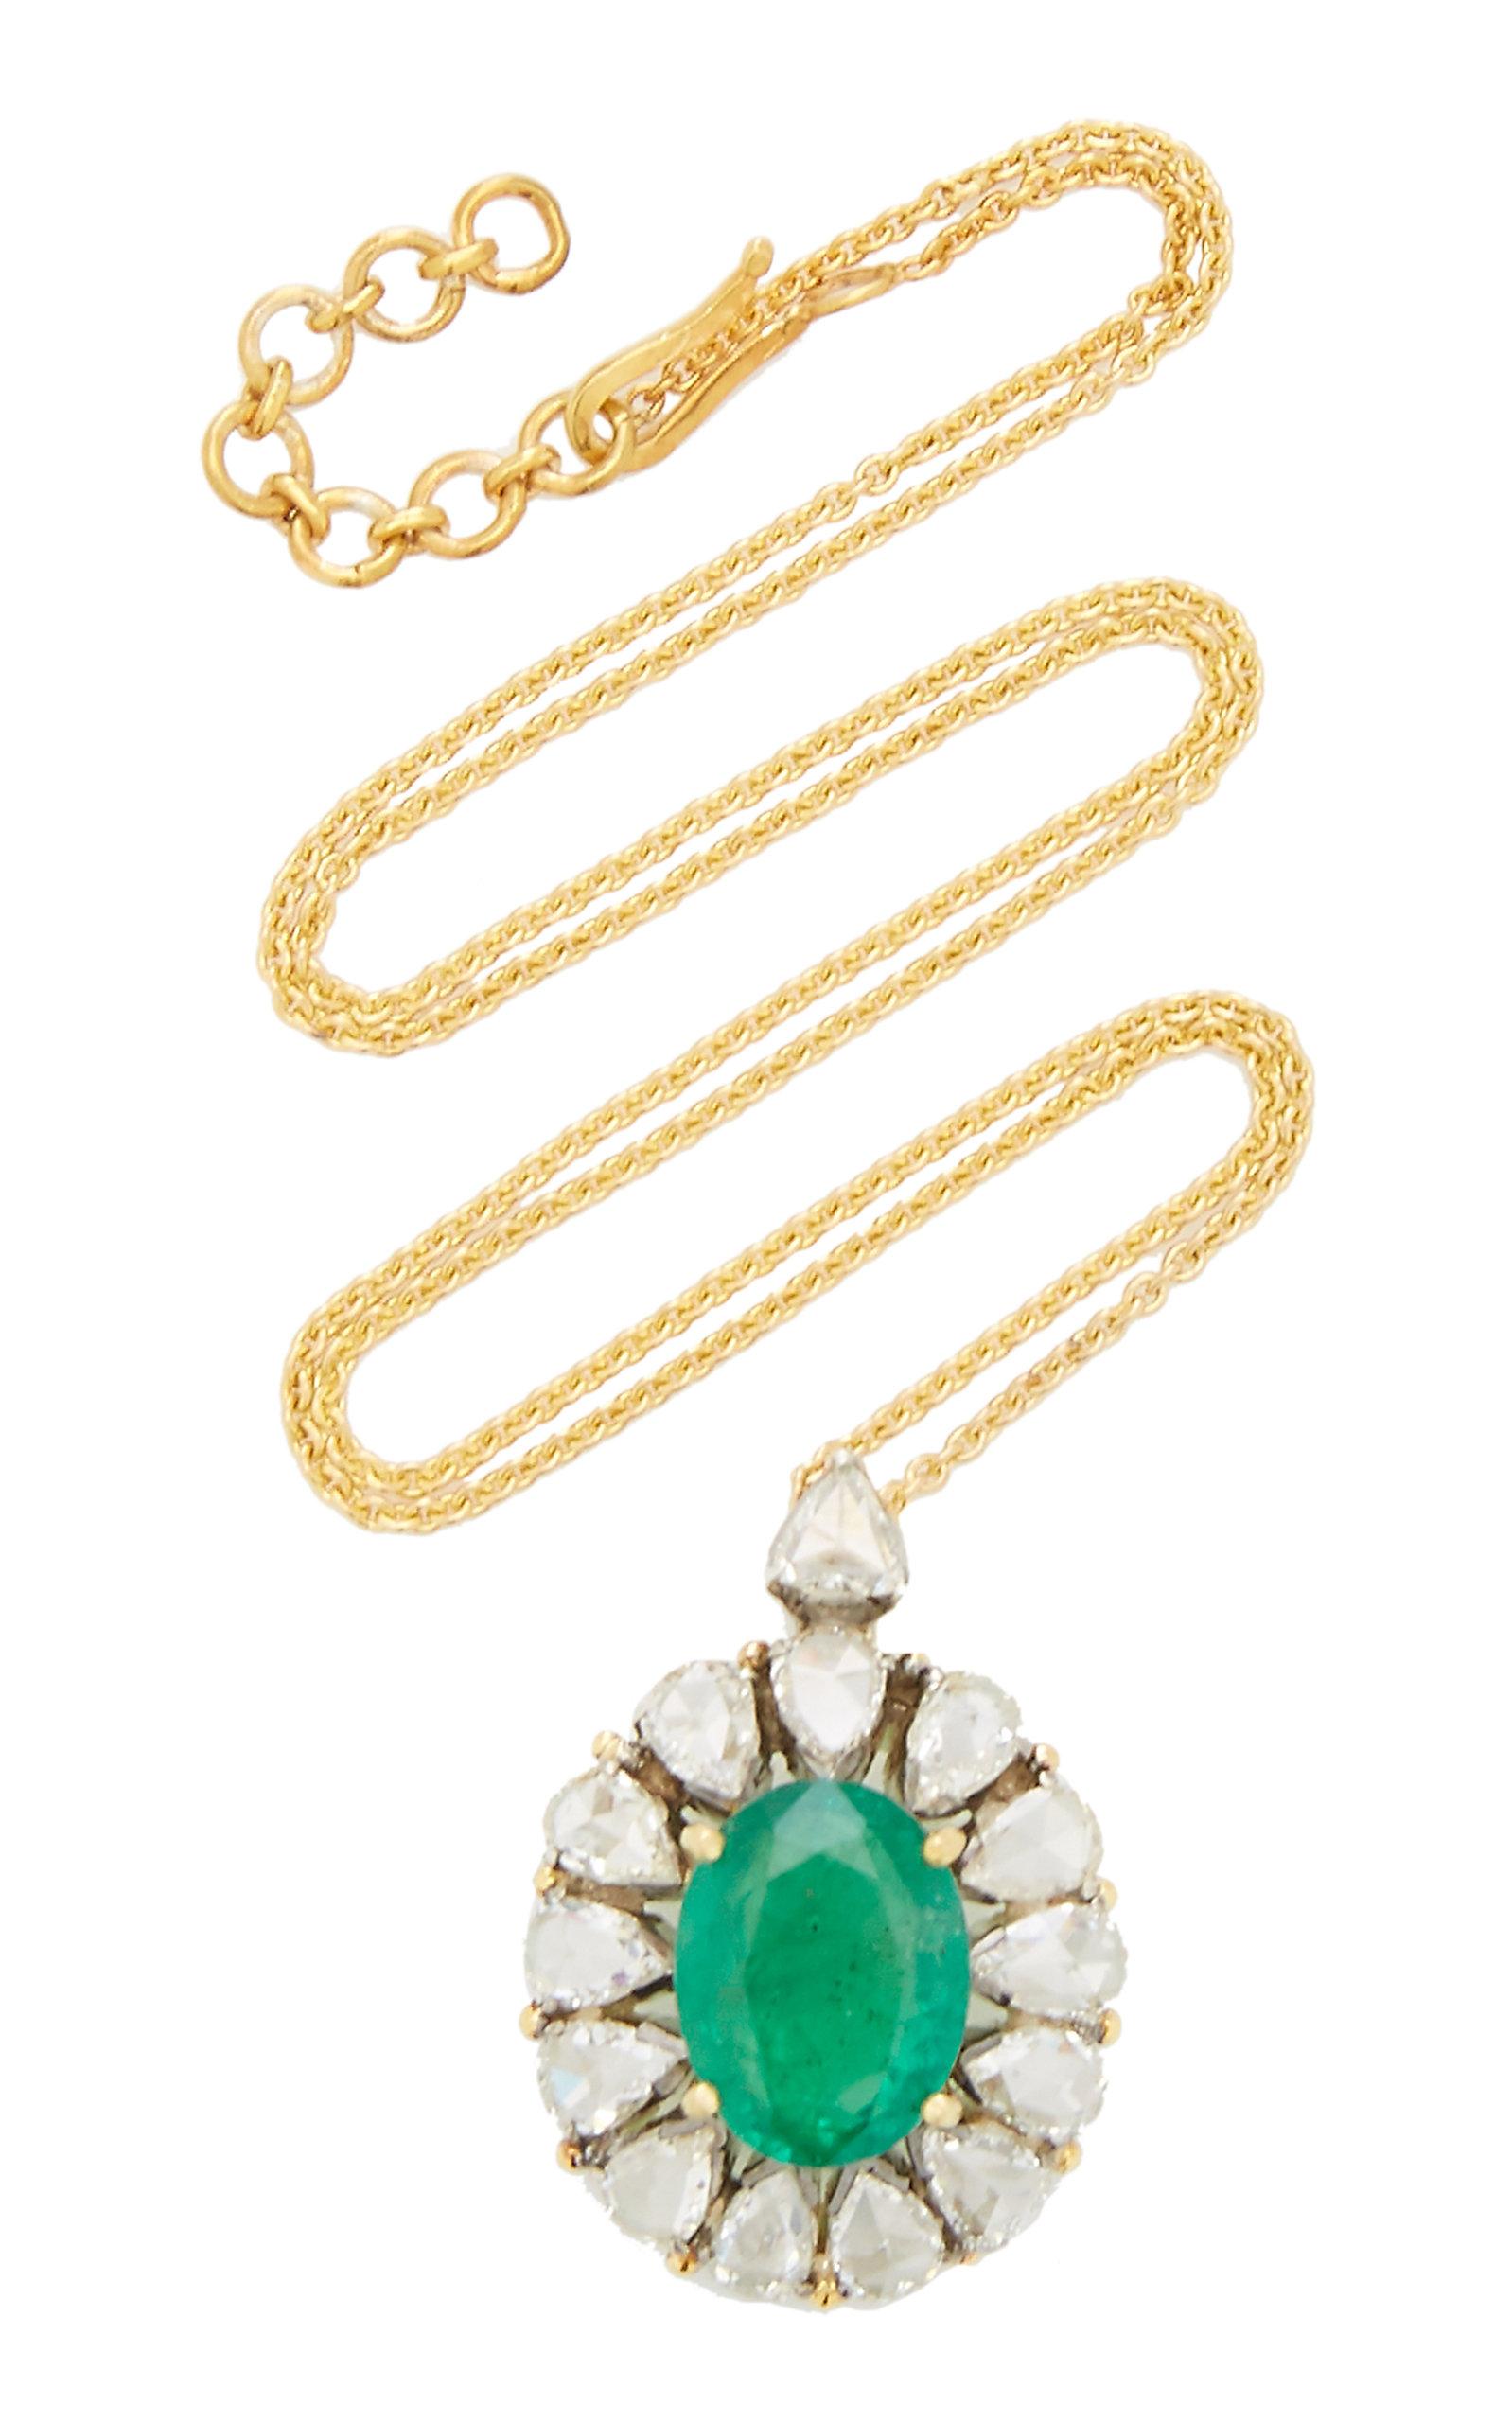 Women's Heirloom 18K Yellow Gold Emerald; Diamond Necklace